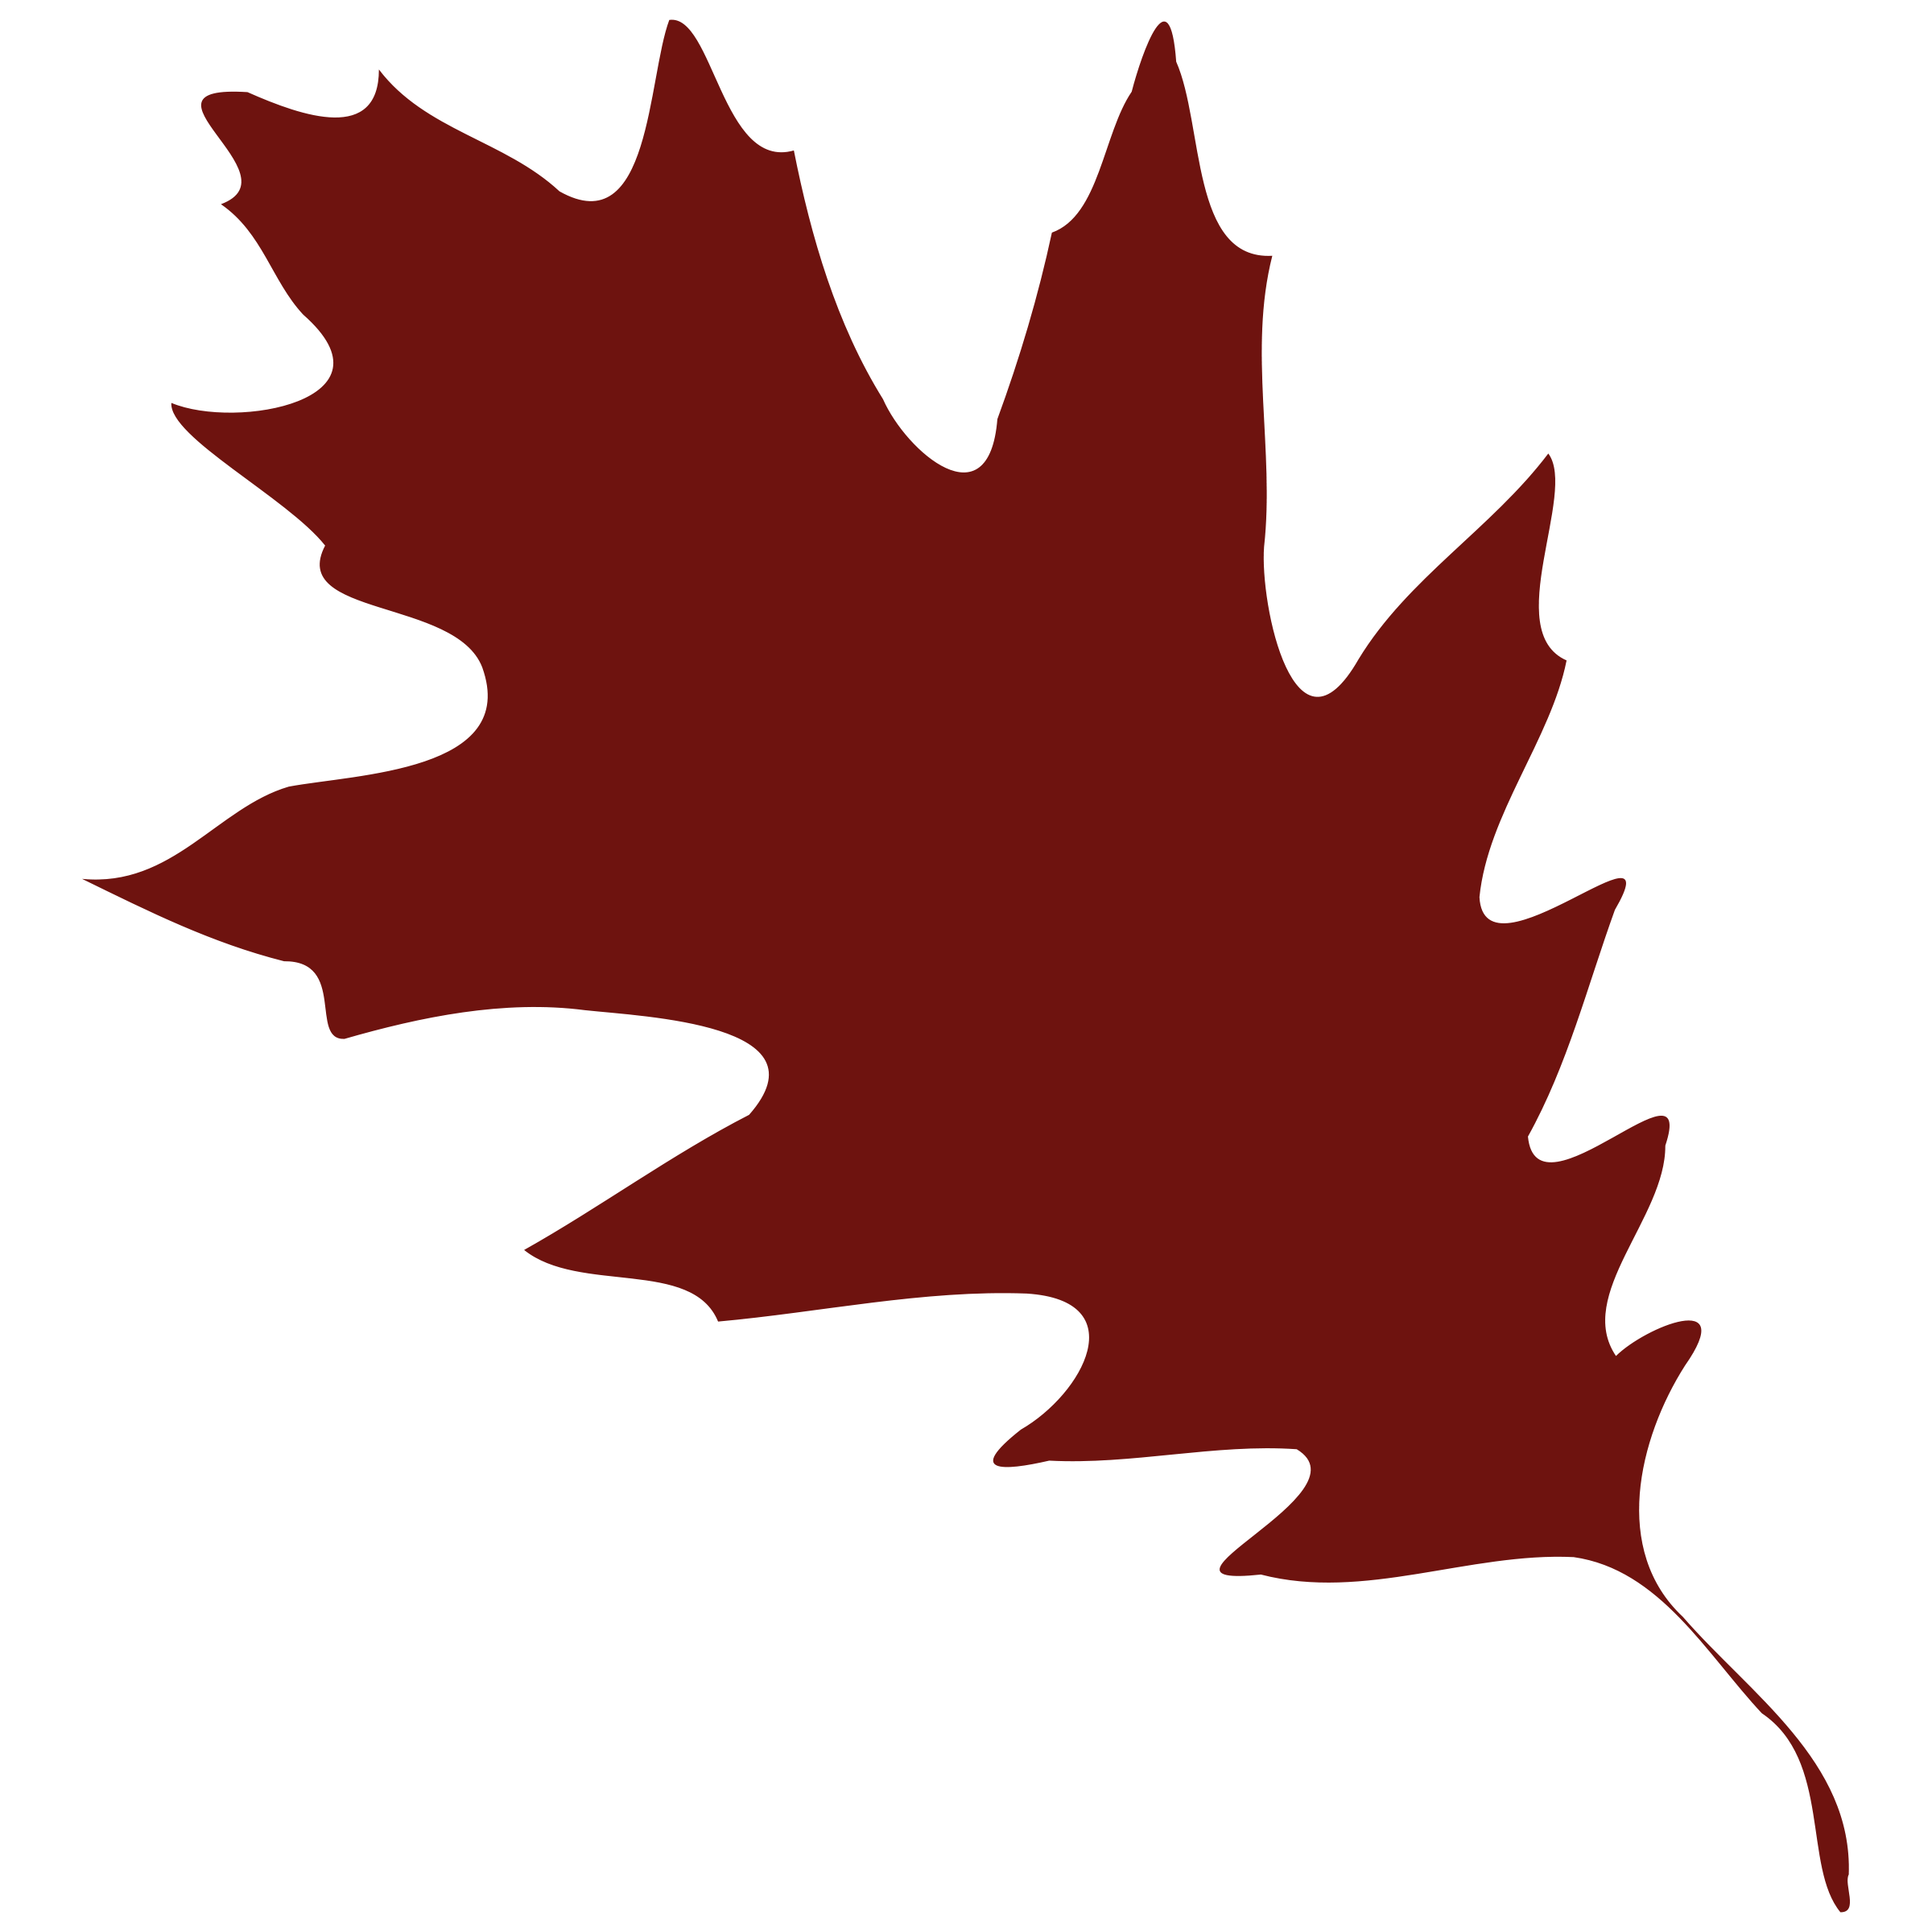 Oak leaves clip art. Fall clipart maple tree